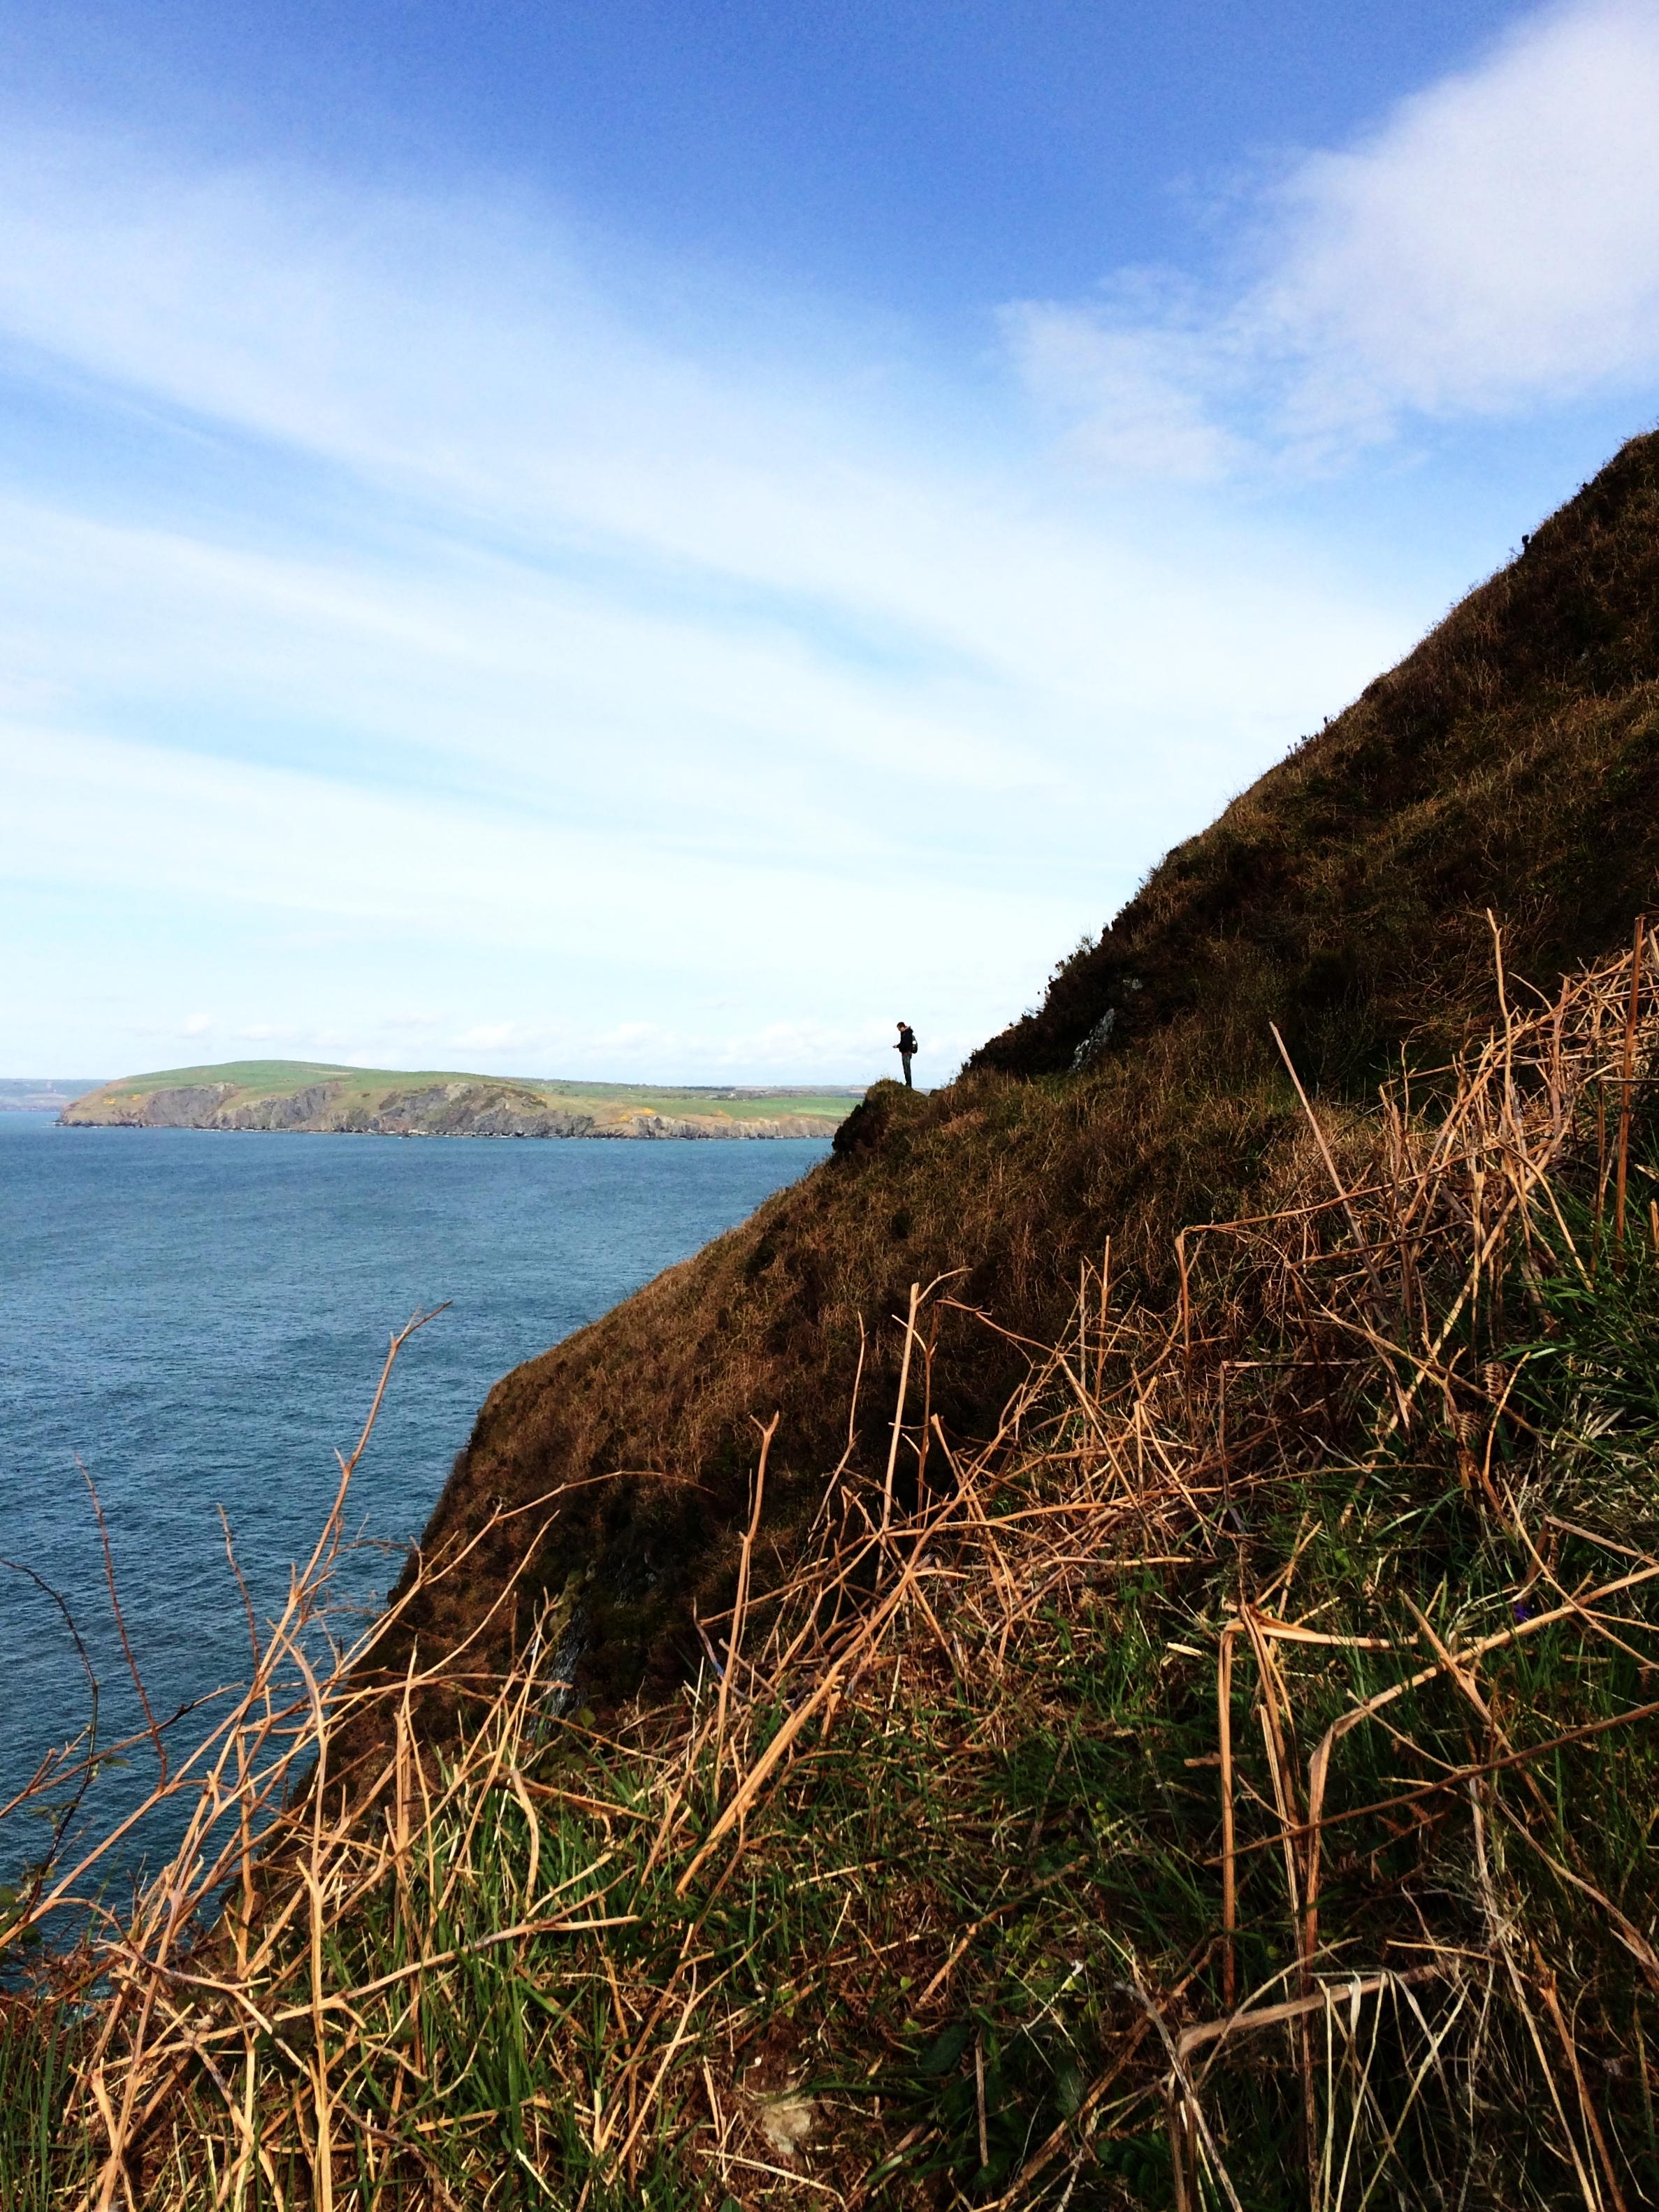 Christian on the Pembrokeshire Coast Path at Dinas Head